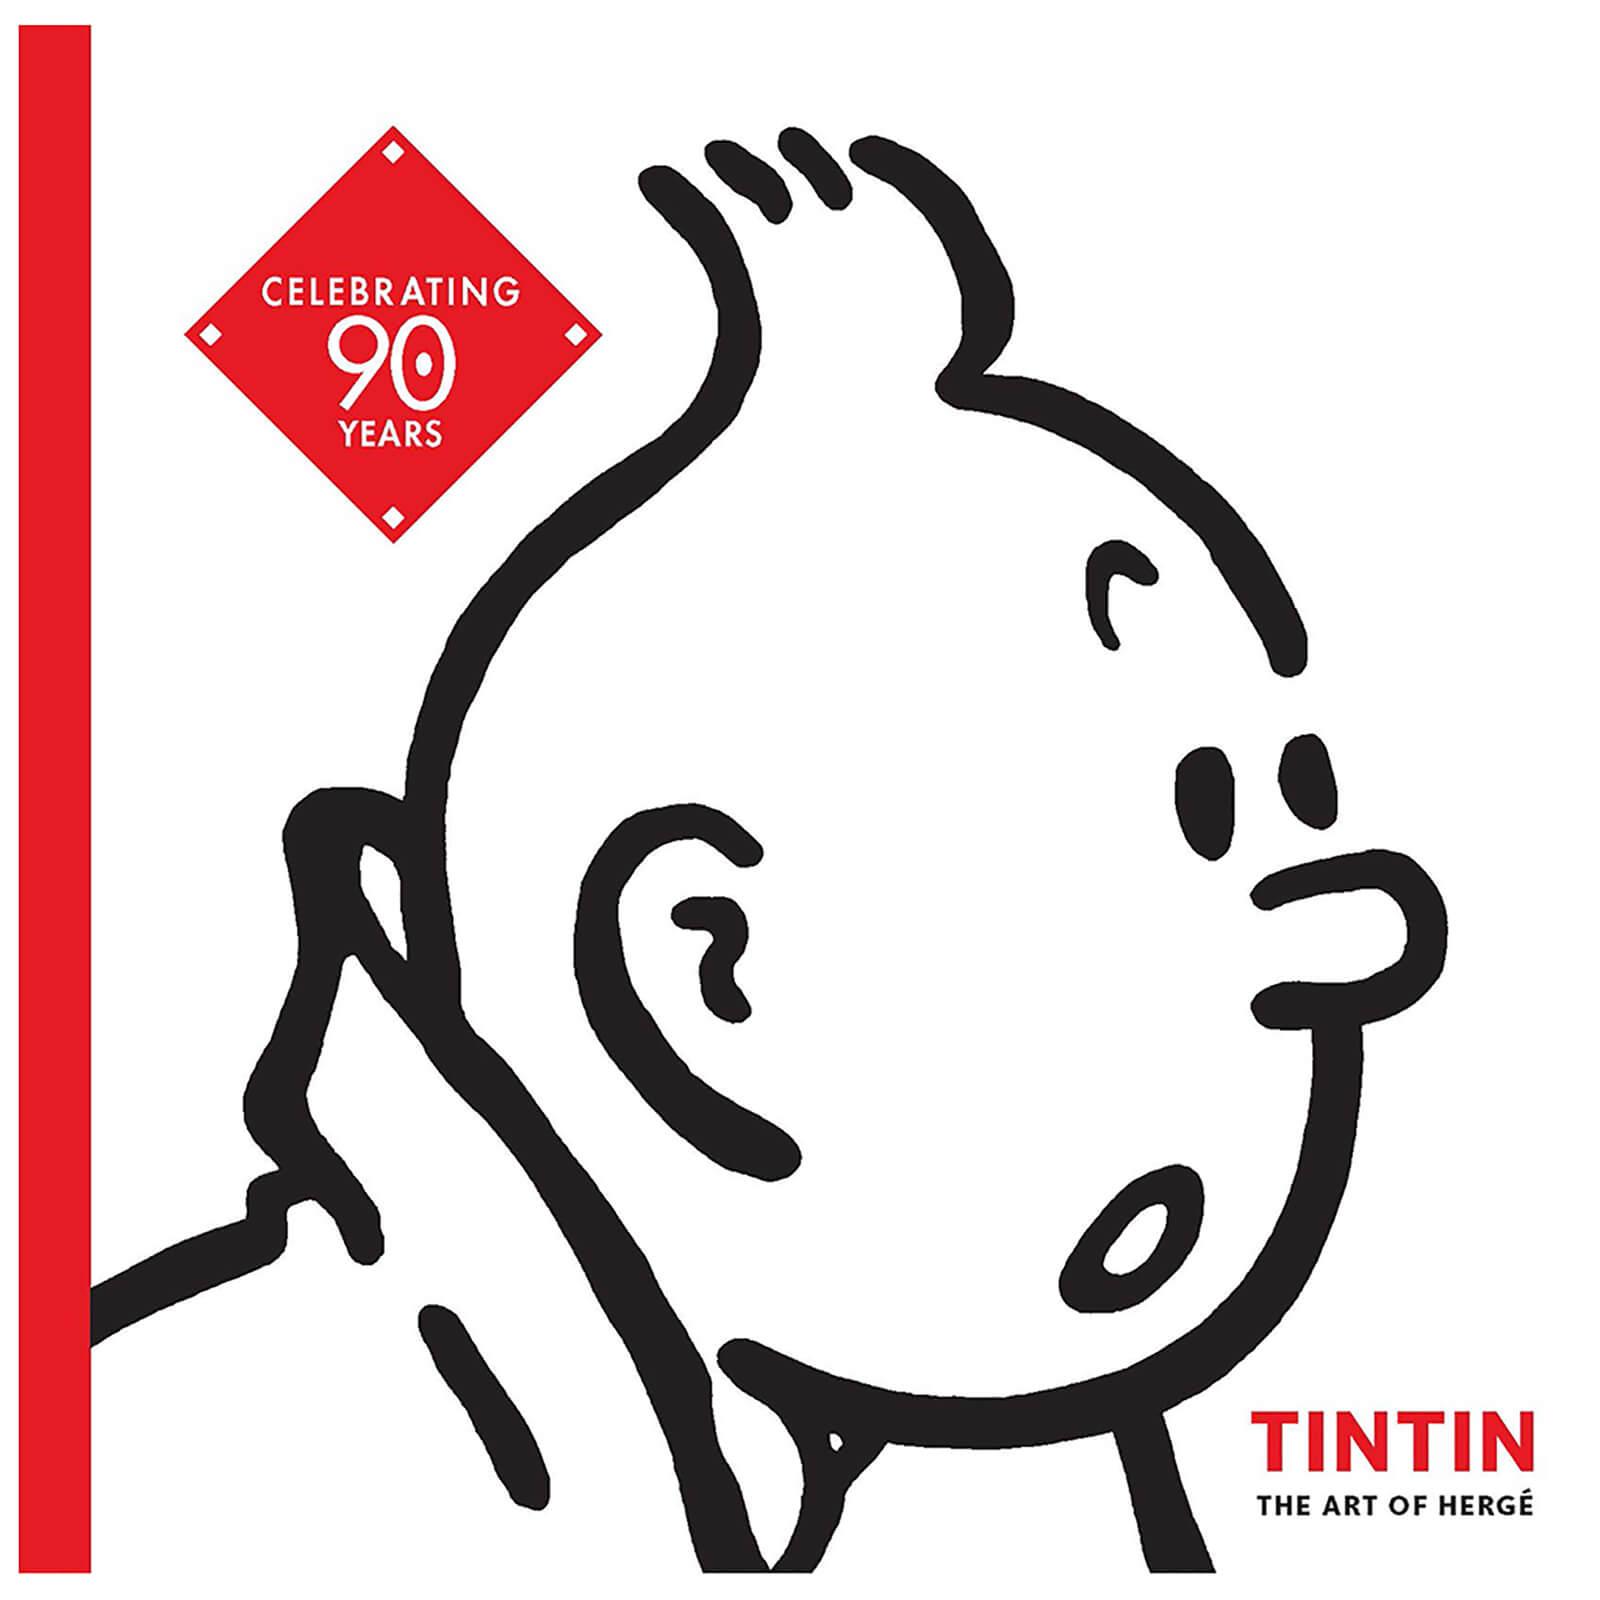 Tintin: The Art of Hergé (Paperback)